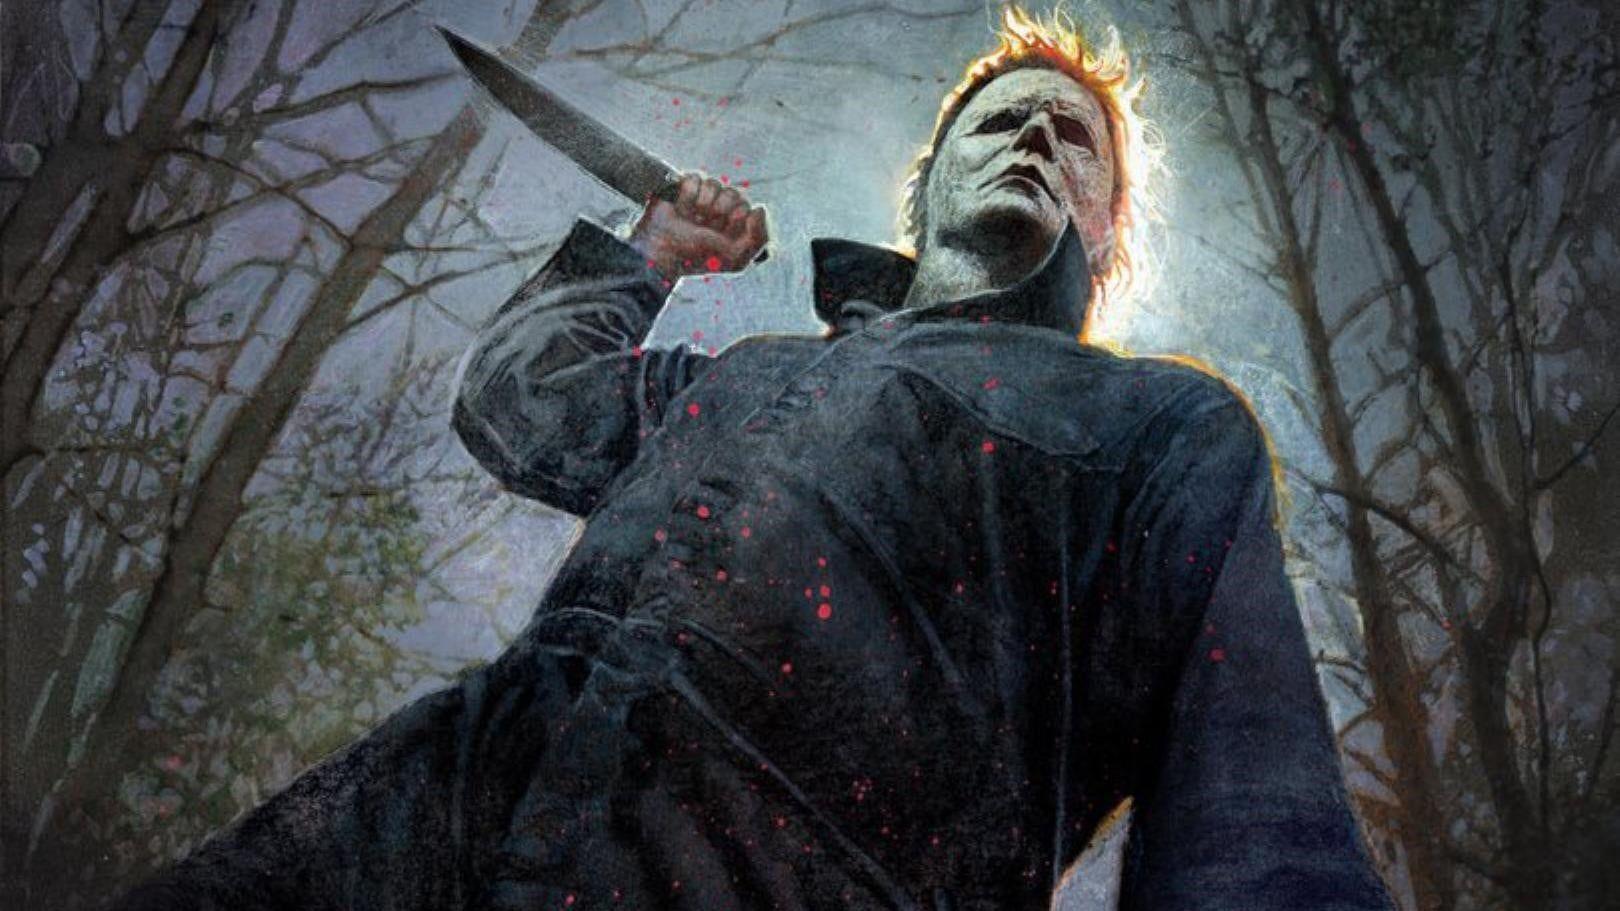 Halloween Film Complet Halloween Film Complet Streaming Vf Halloween Film Complet Vf 2018 Halloween Fi Noche De Halloween Peliculas Cine Peliculas Completas